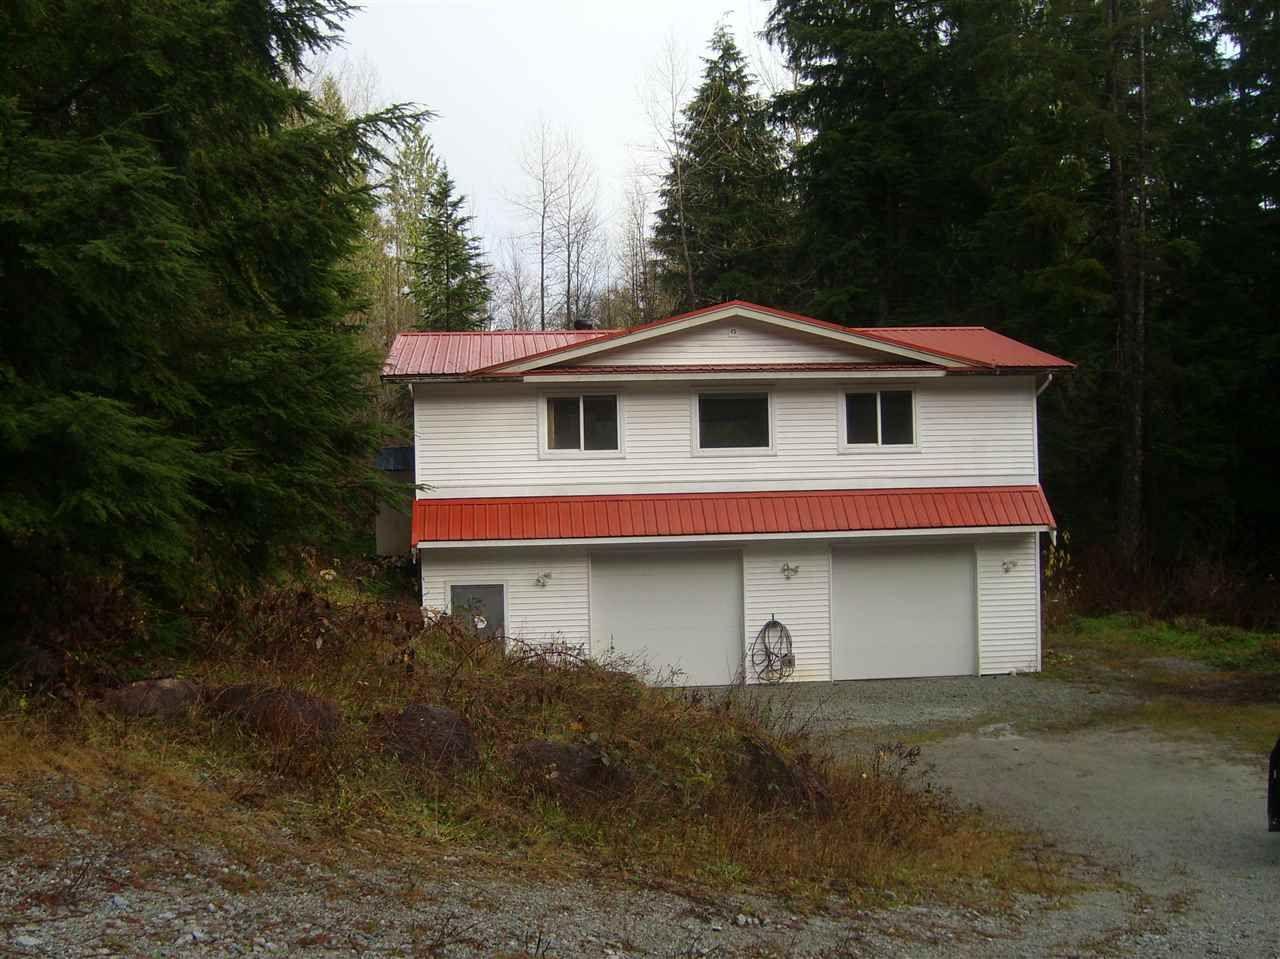 Photo 19: Photos: 28640 123 Avenue in Maple Ridge: Northeast House for sale : MLS®# R2419989